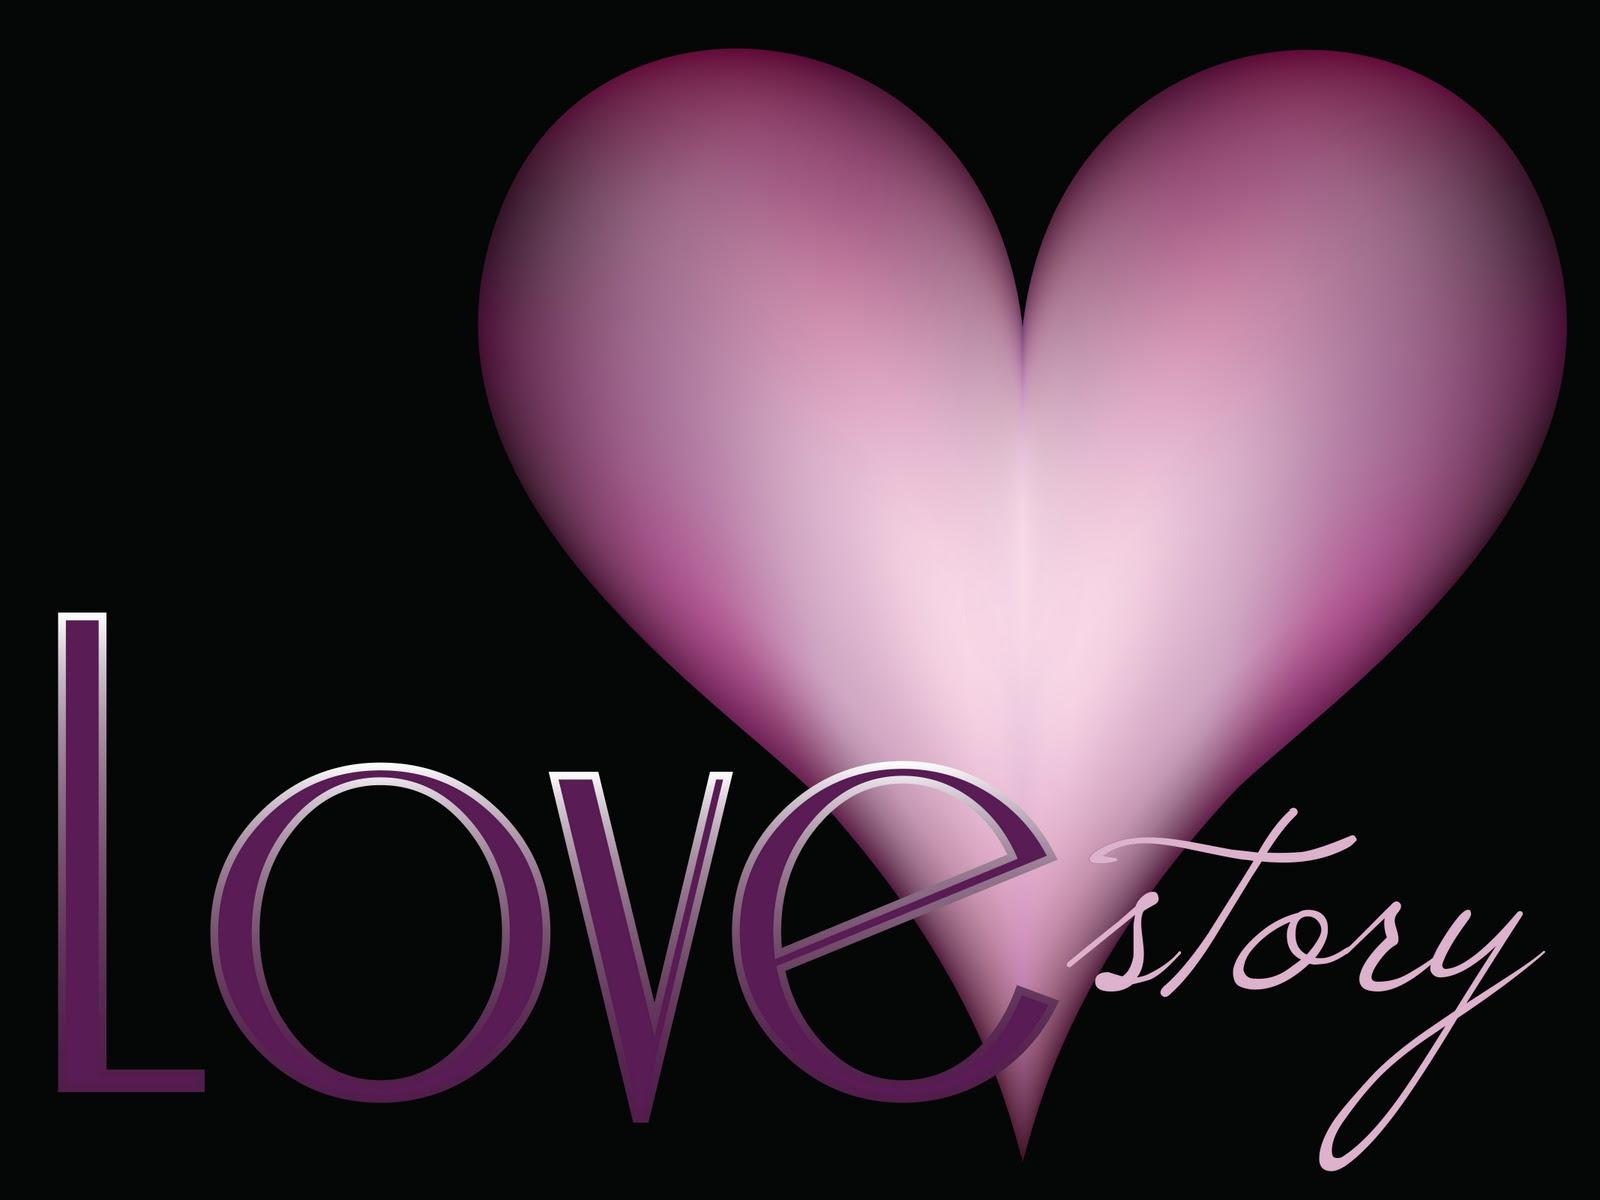 Koleksi Cerita Pendek Tentang Cinta Romantis Sedih Persahabatan